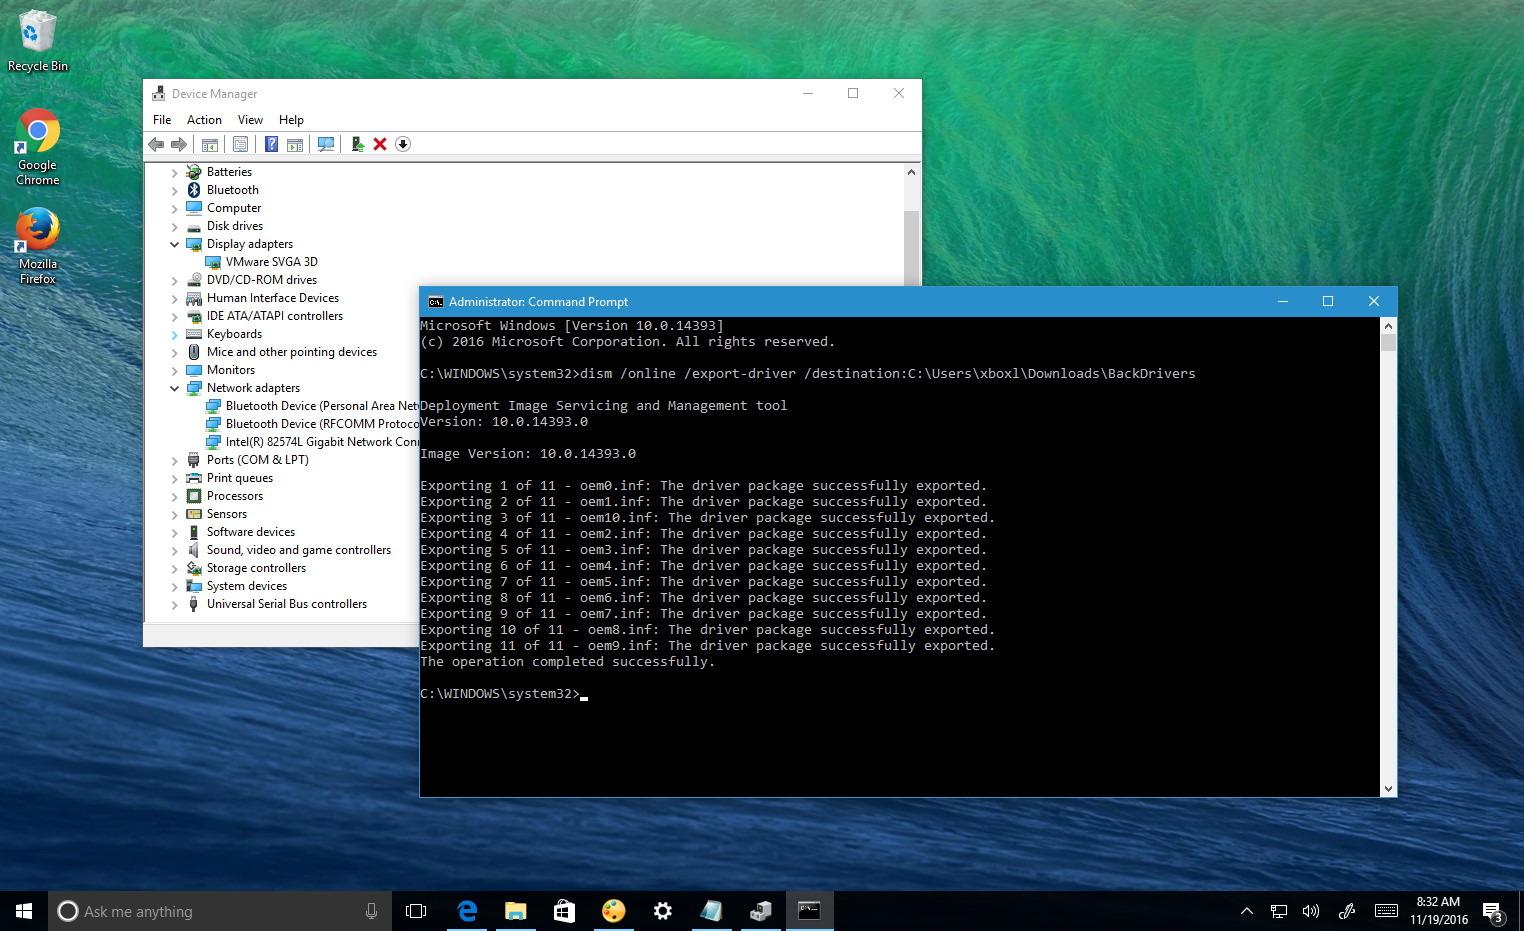 Backup drivers on Windows 10